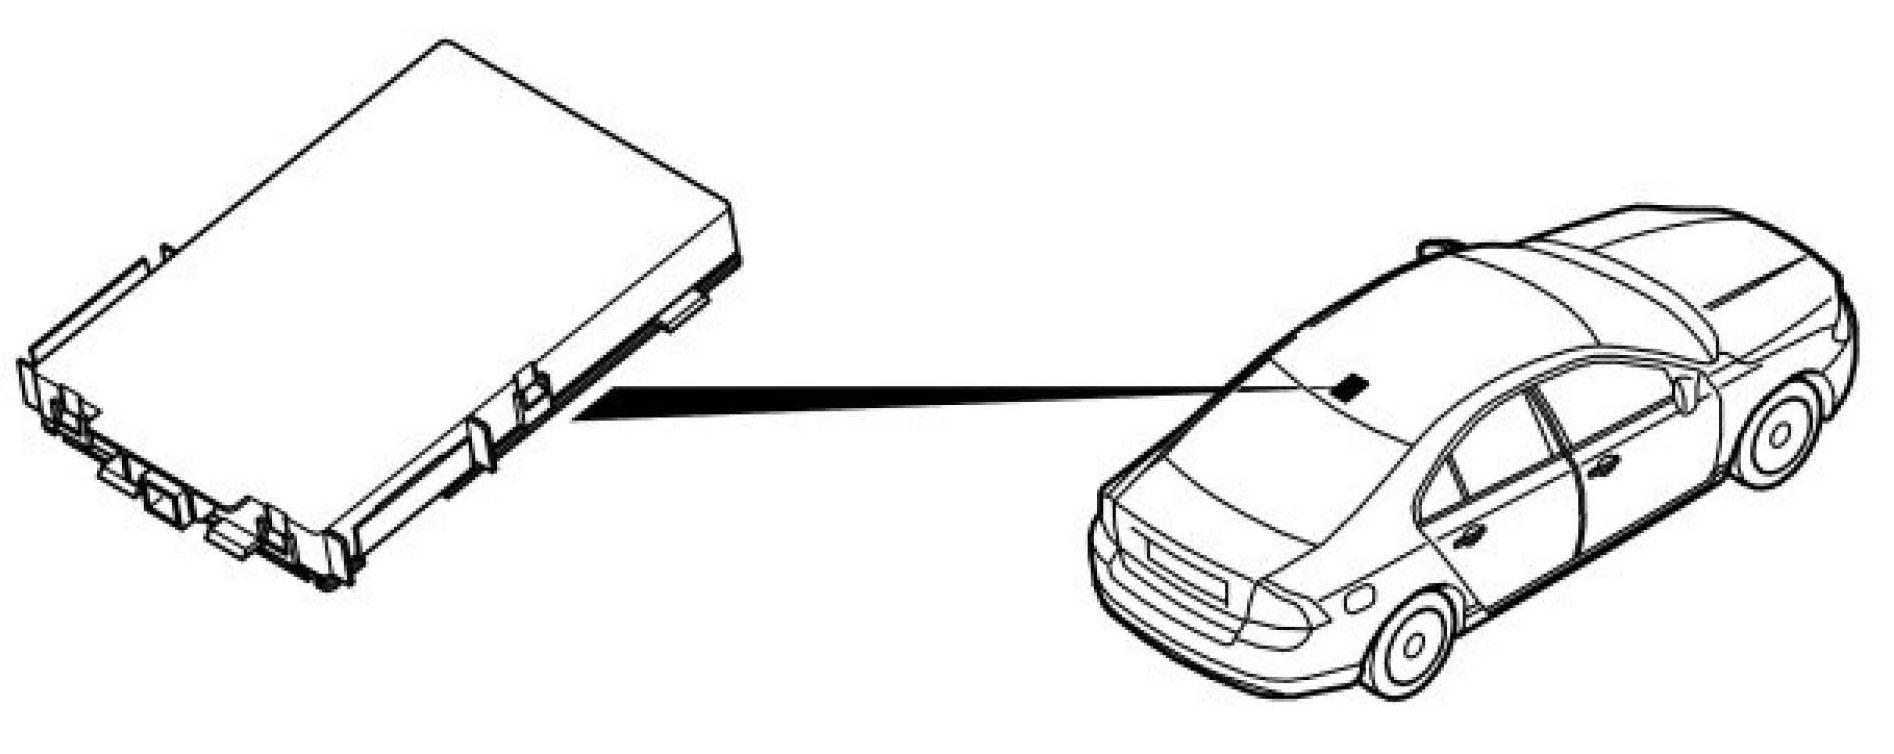 1999 Volvo V70R 150k miles how do I reset immobilizer using keys in